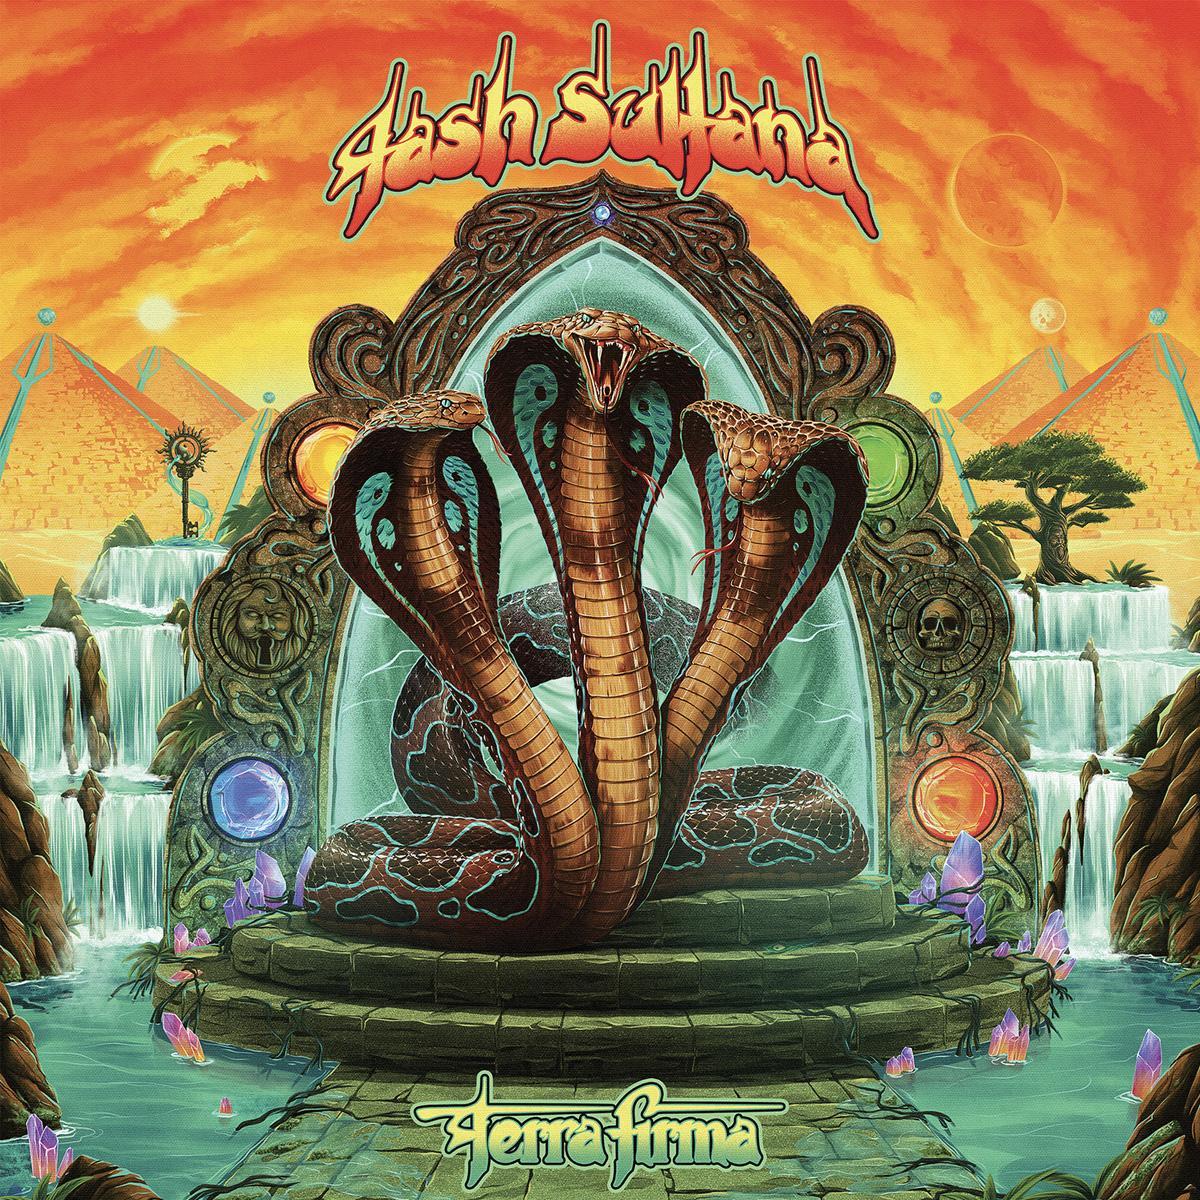 Tash Sultana new album 2021 Terra Firma